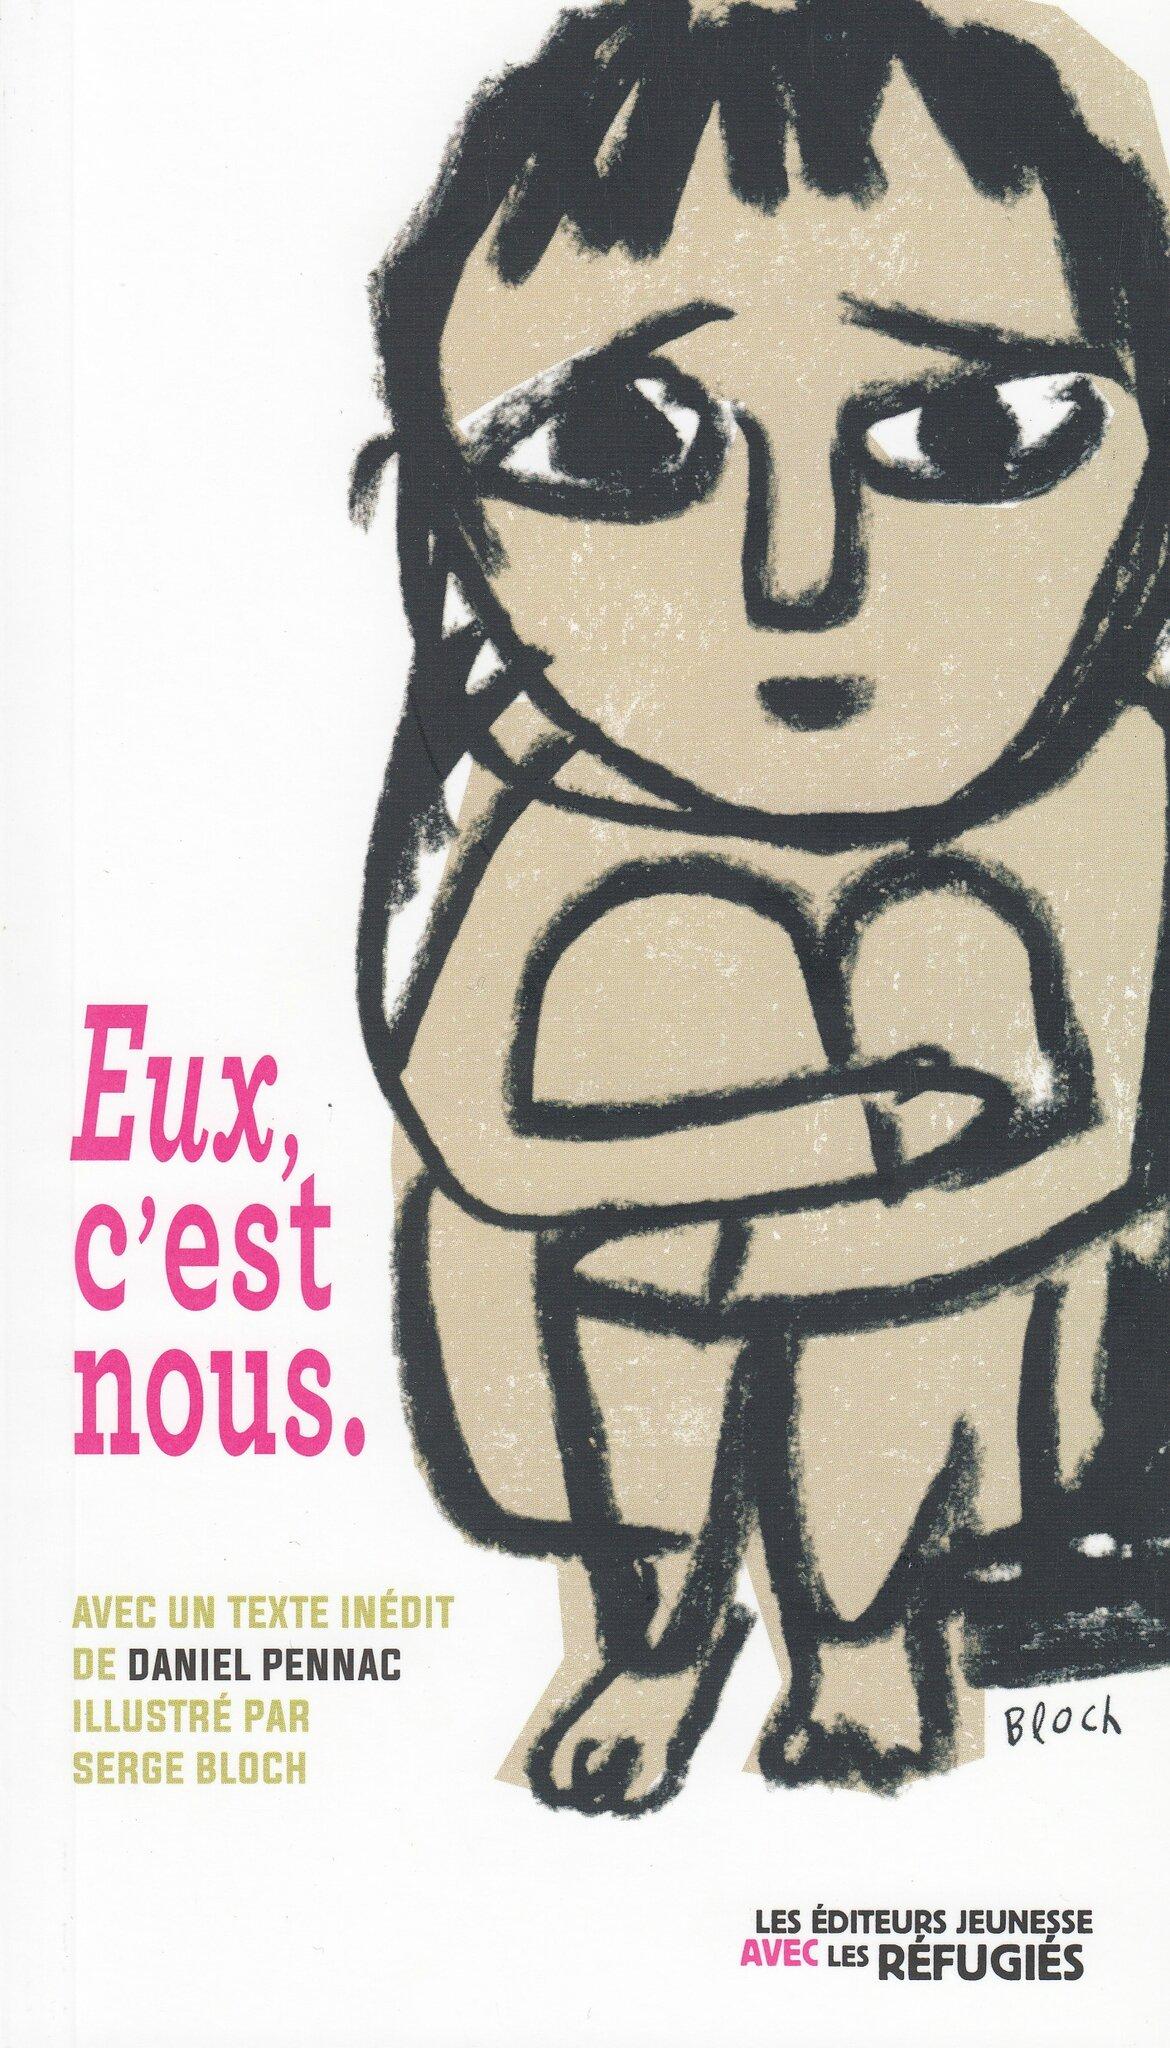 # 154 Eux c'est Nous, Collection Cimade, Daniel Pennac, Jessie Magana, Carole Saturno, Serge Bloch